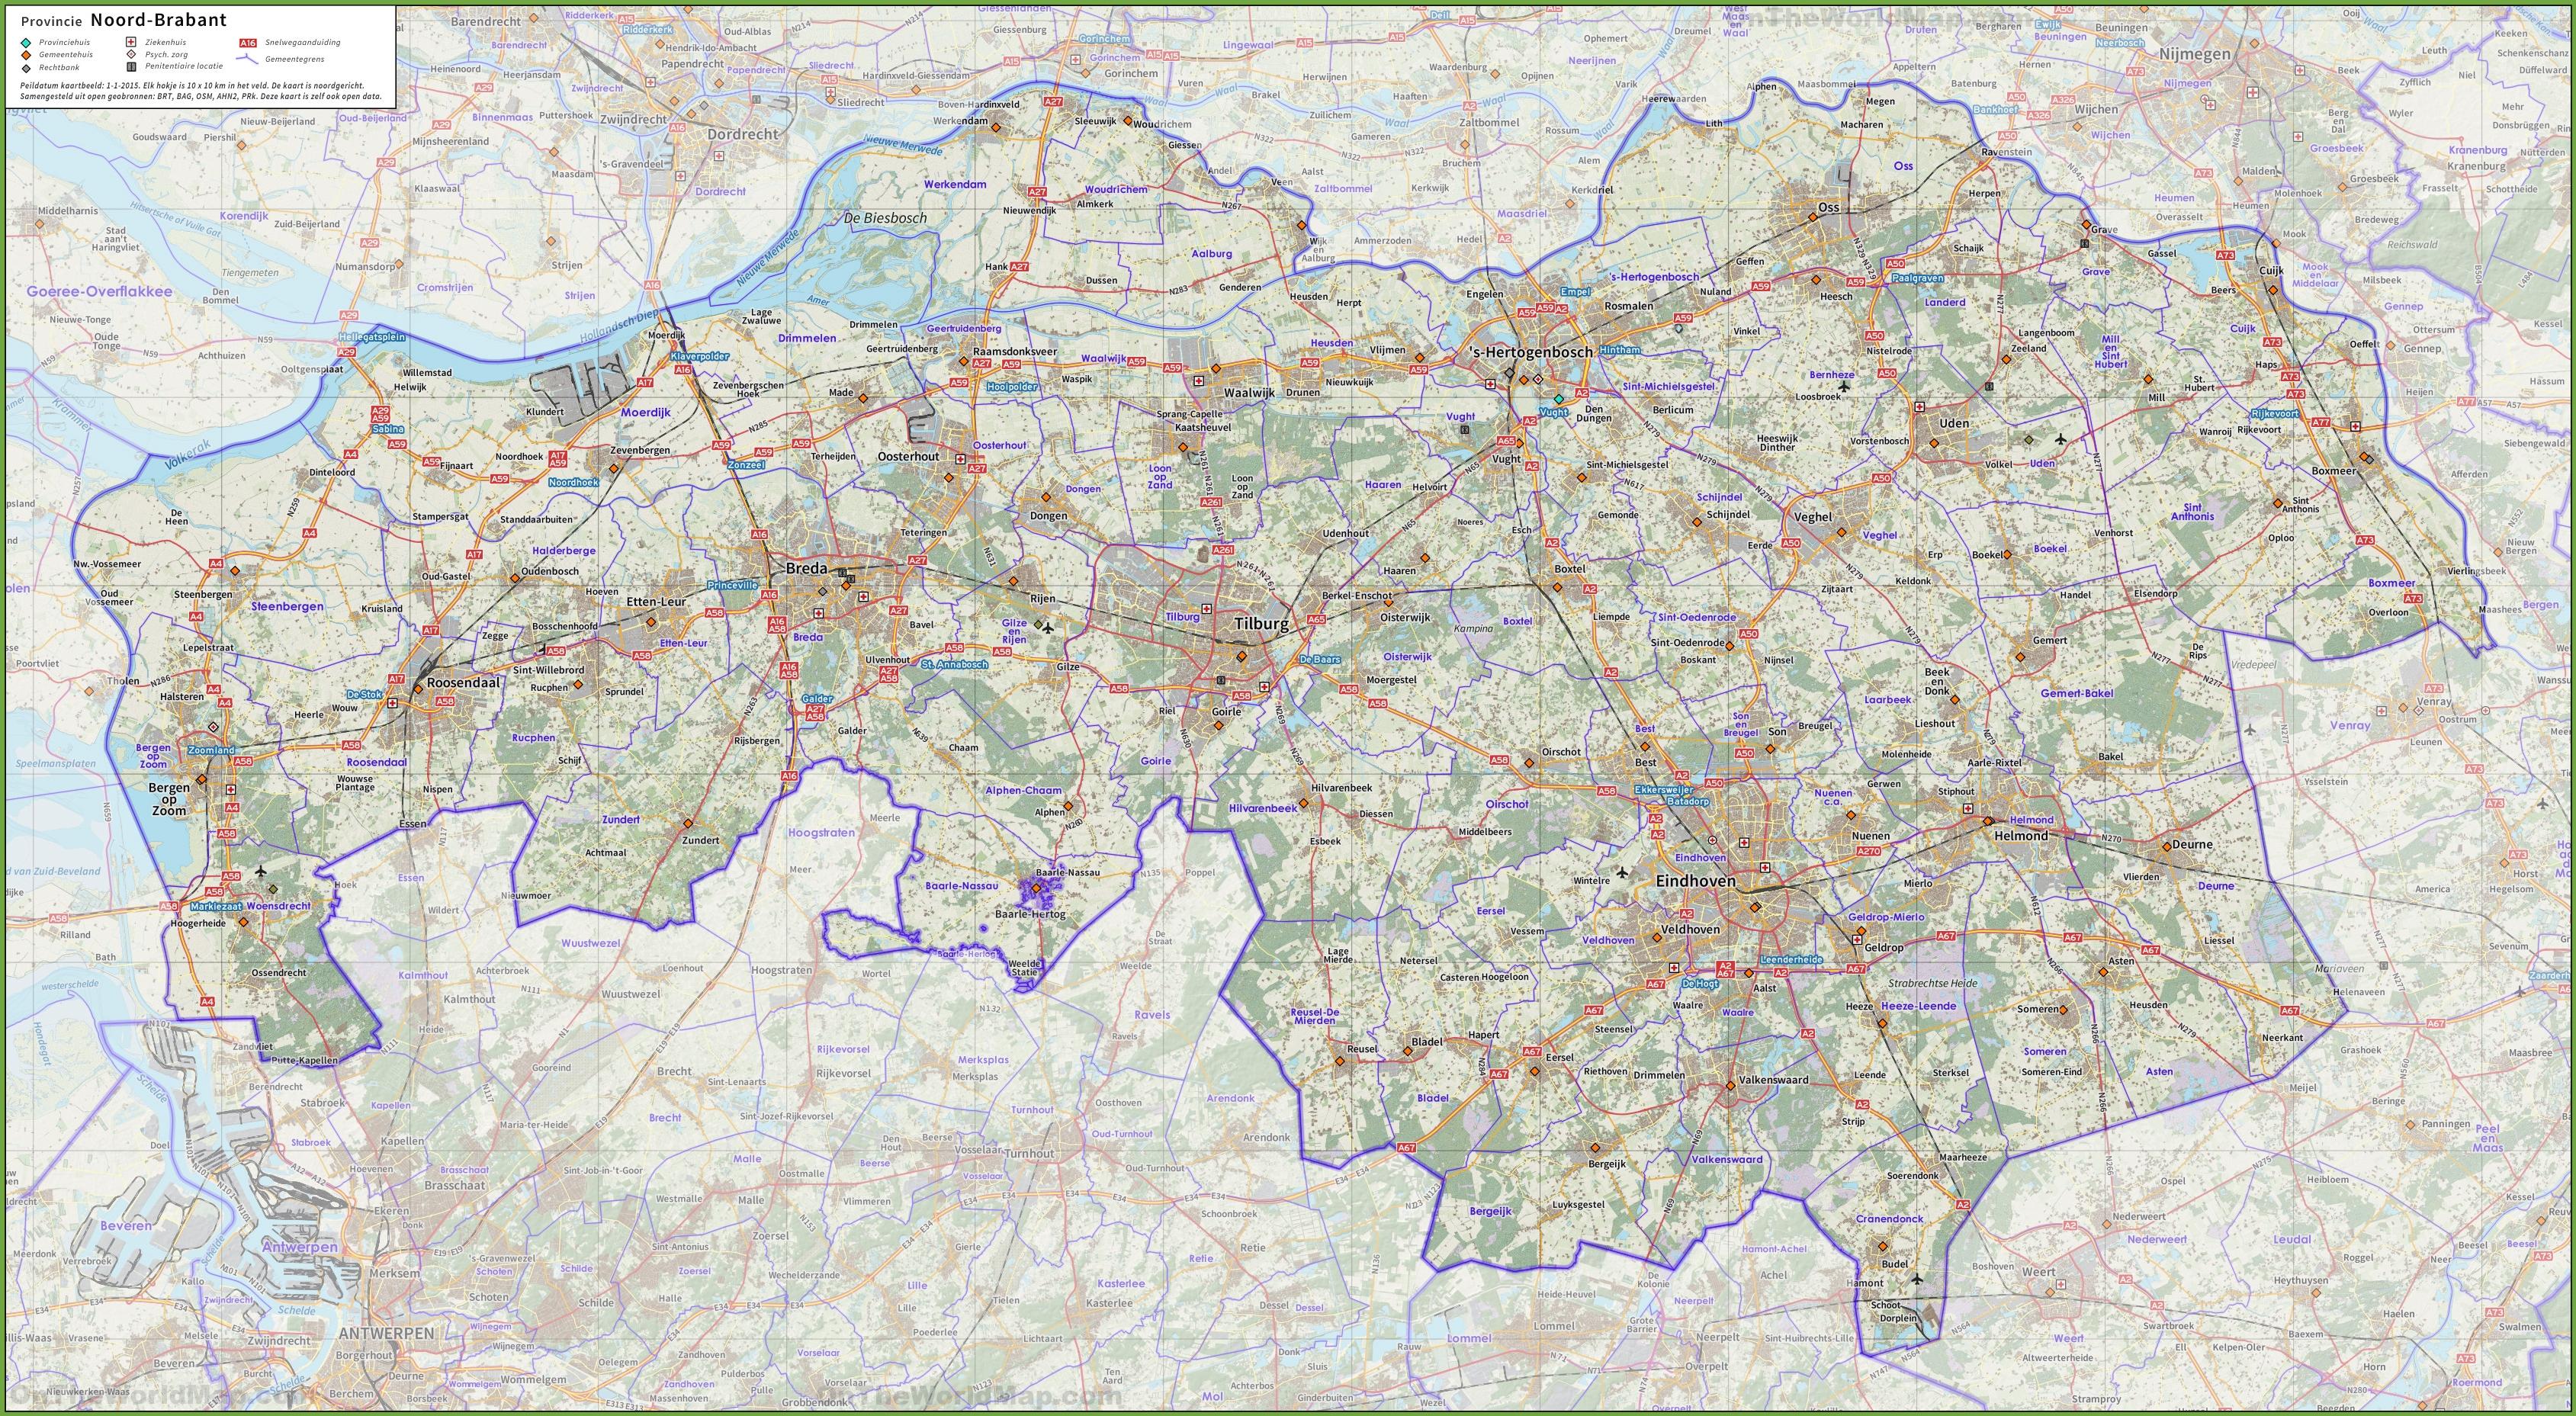 North Brabant road map